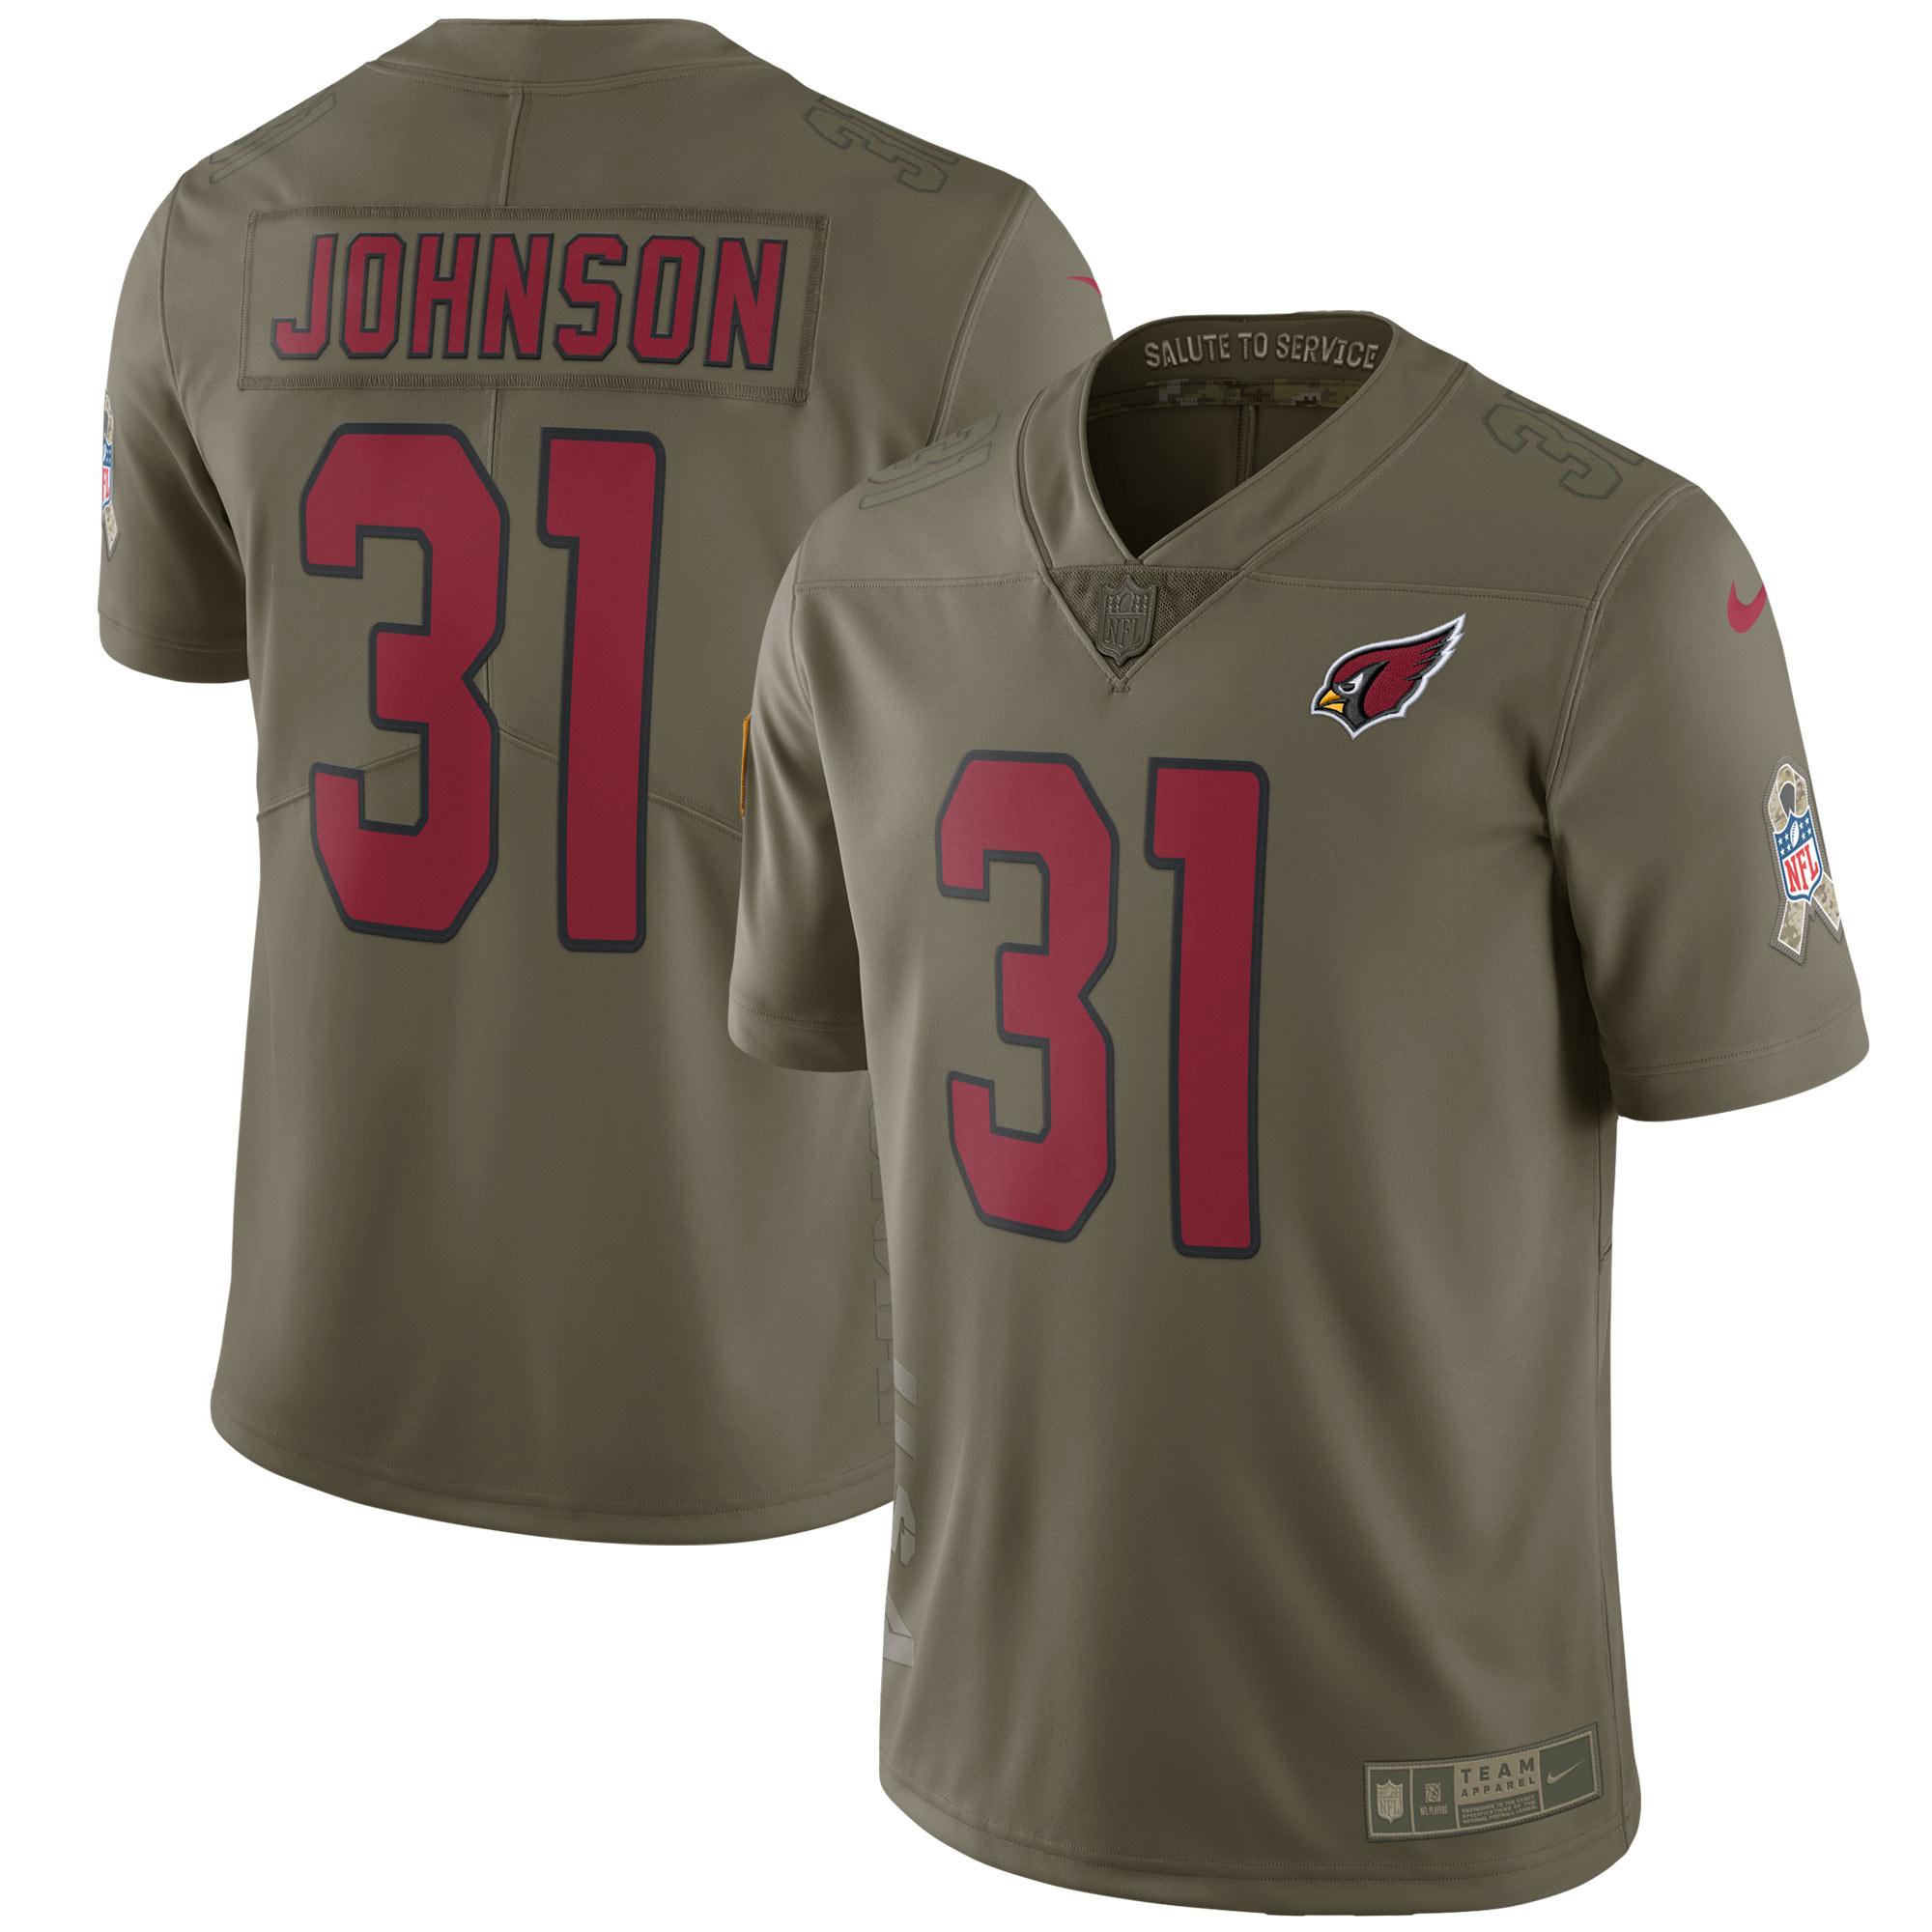 David Johnson Arizona Cardinals Nike Salute To Service Limited Jersey - Olive